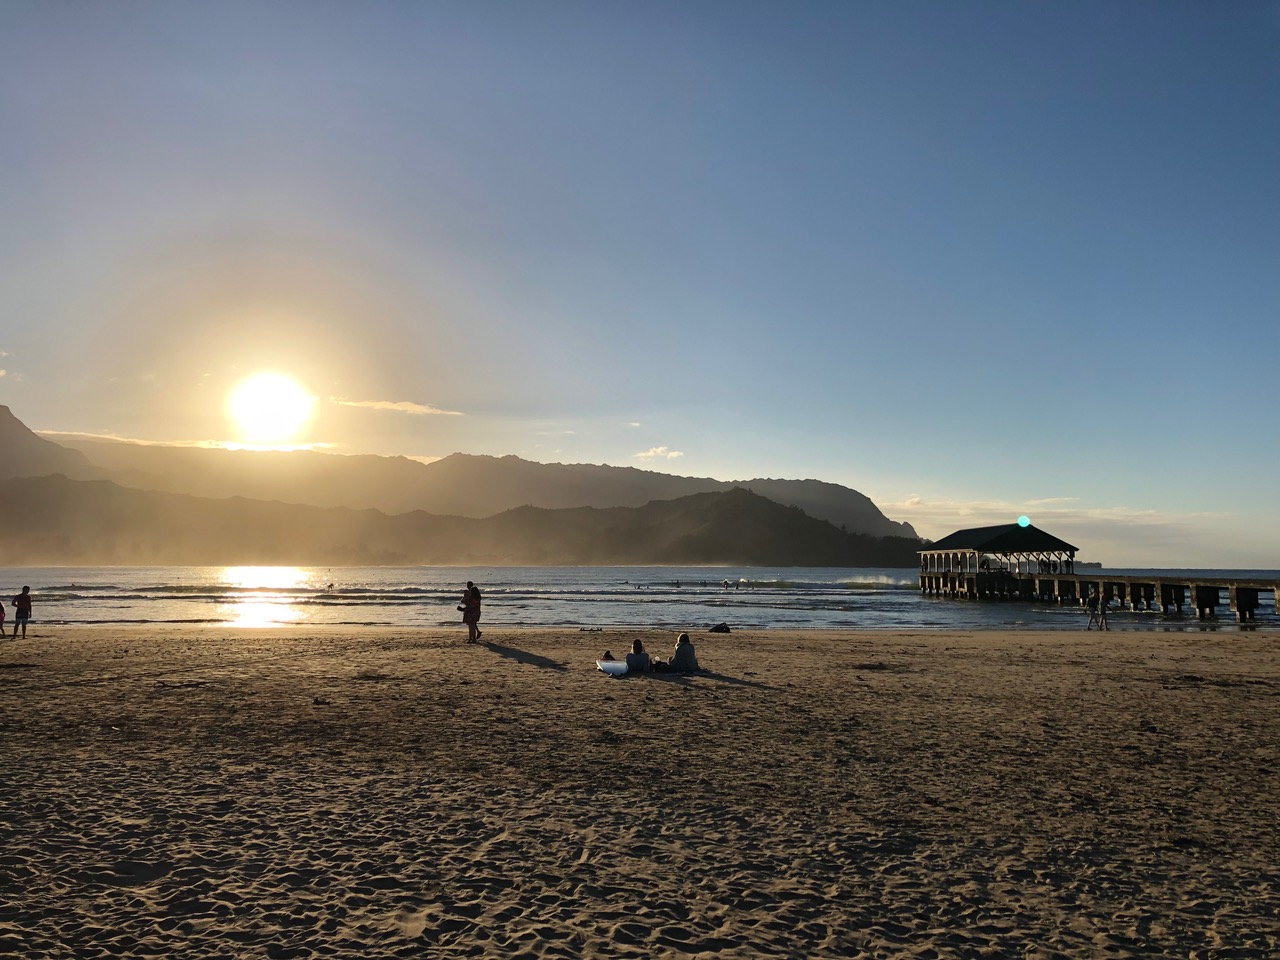 Our last Sunset in Kauai